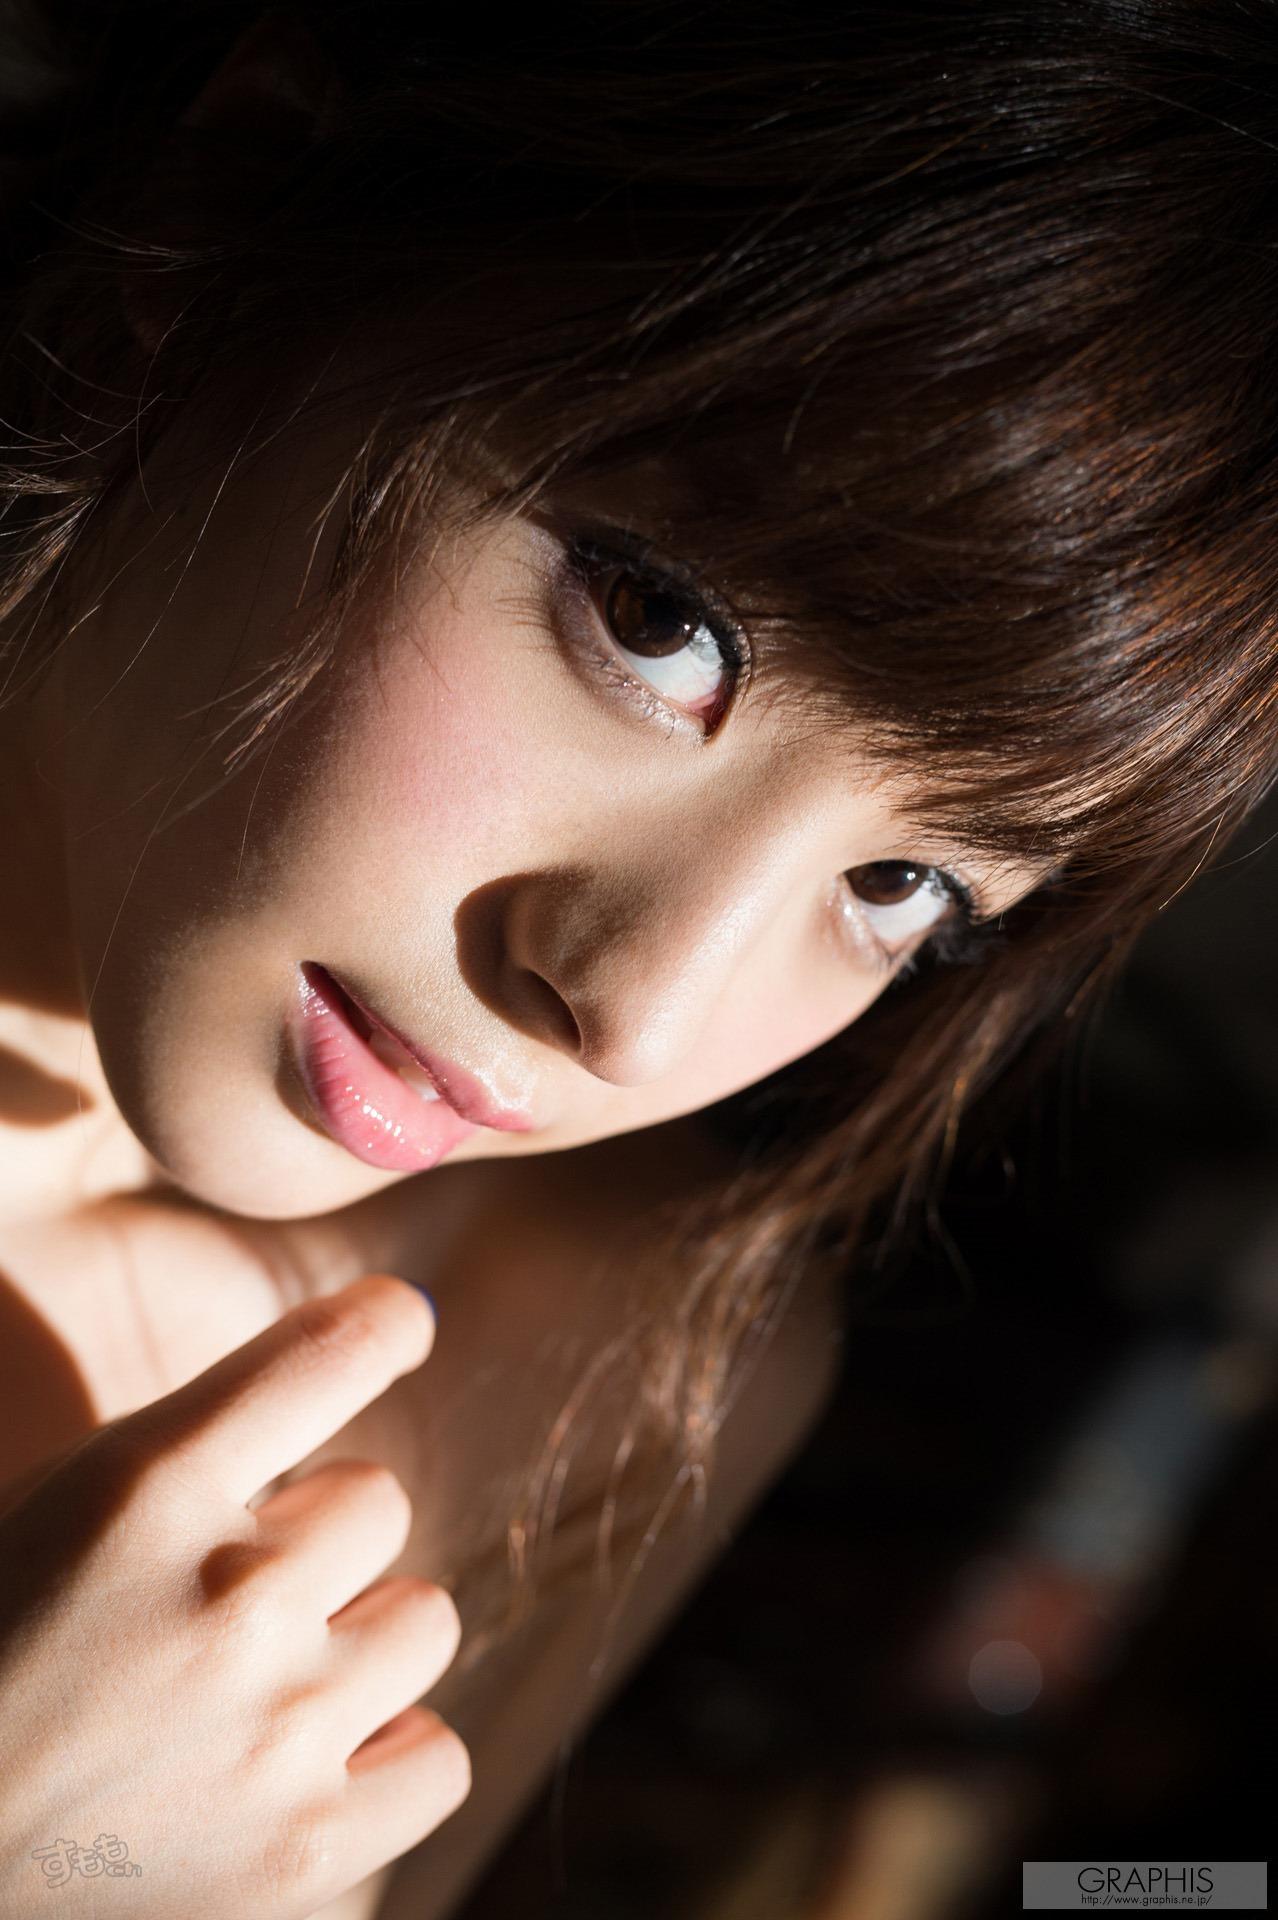 ICHIKAさんのプロフィールと画像集10ページ目   AV女優画像-ラブ